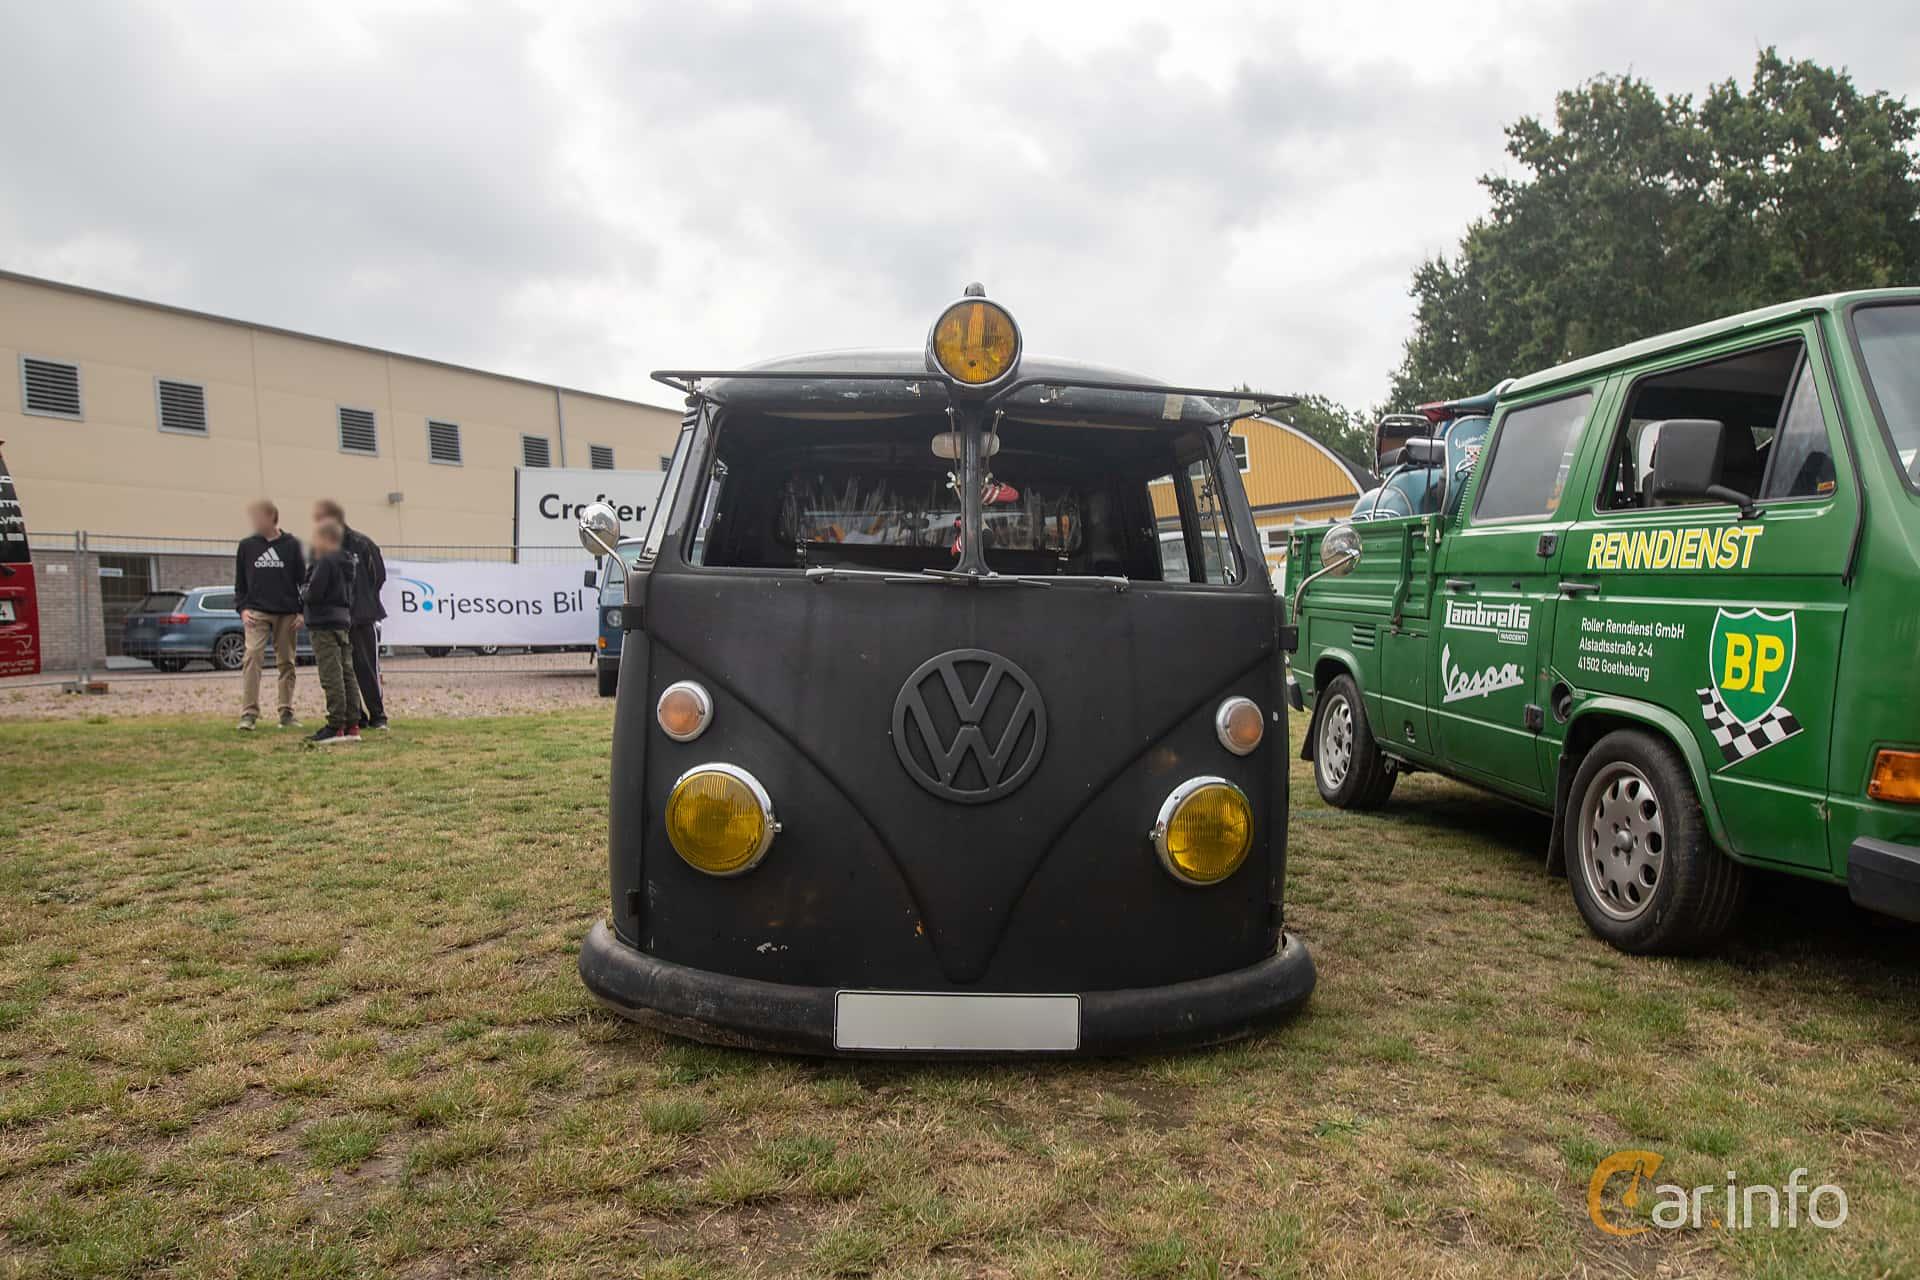 Front  of Volkswagen Transporter 1500 Pickup 1.5 Manual, 44ps, 1966 at West Coast Bug Meet 2019